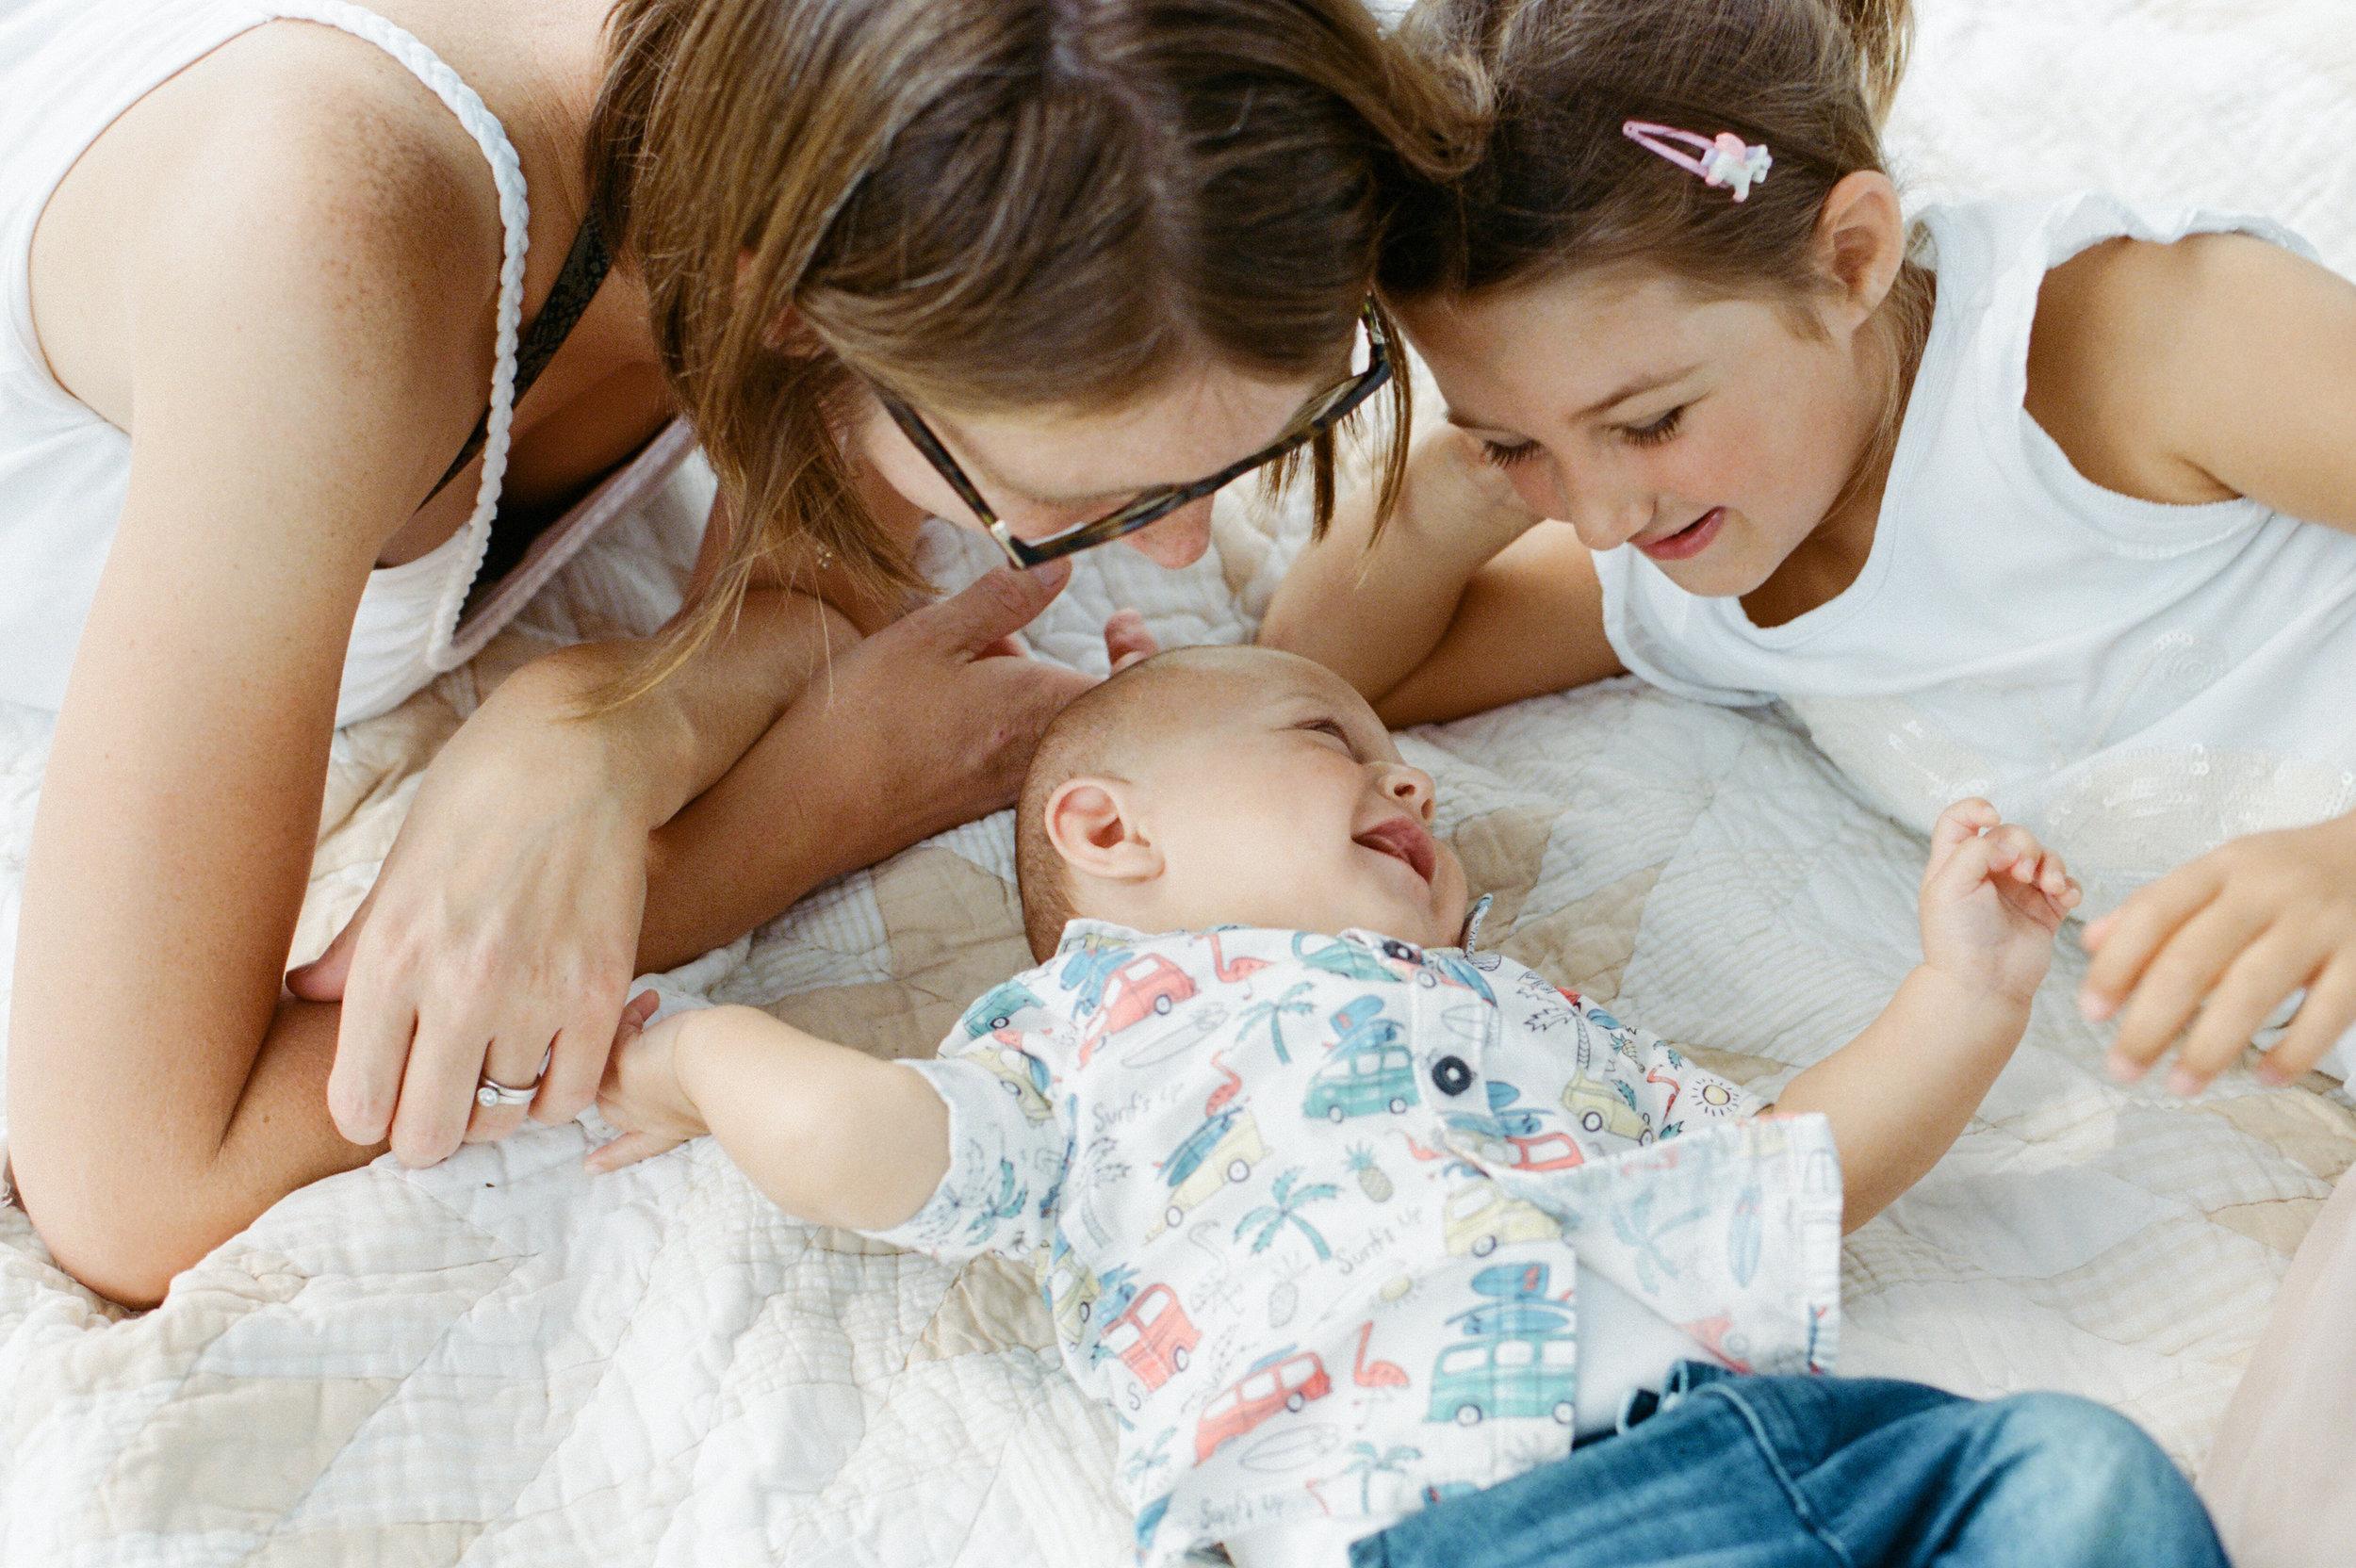 Nicola_London_Family_Photographer-153 copy.jpg